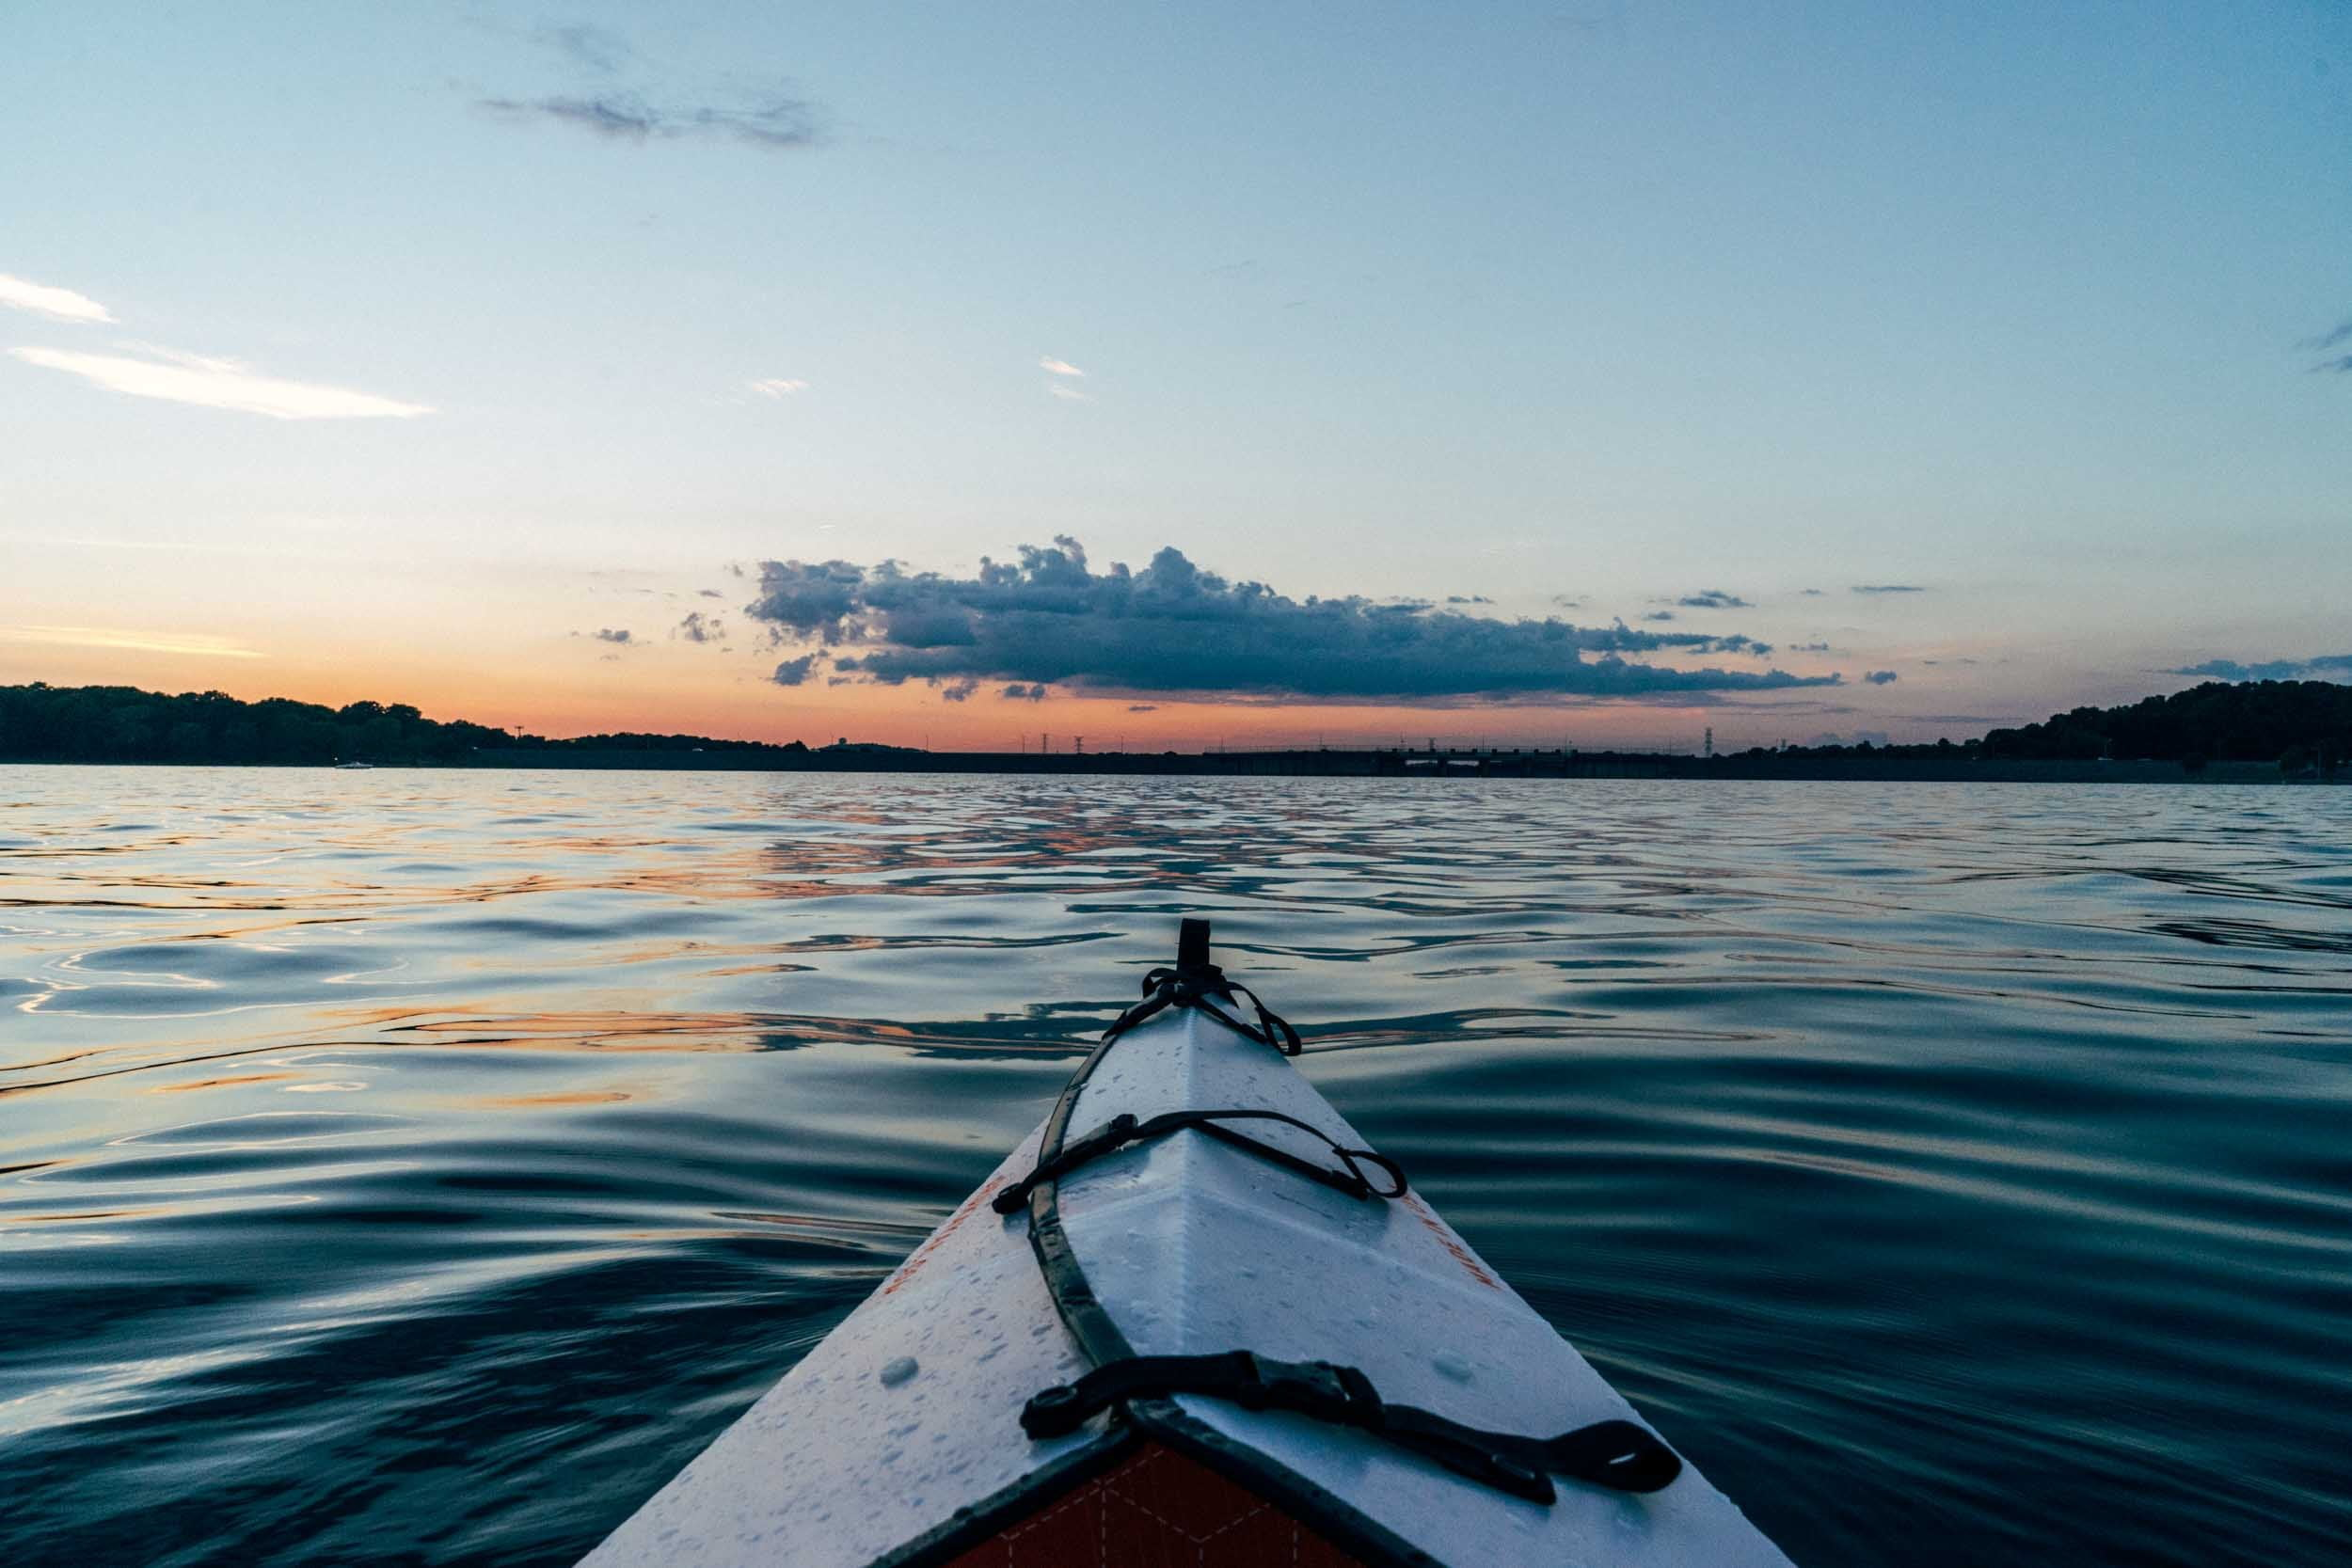 Water Activity in Malaga: Kayak